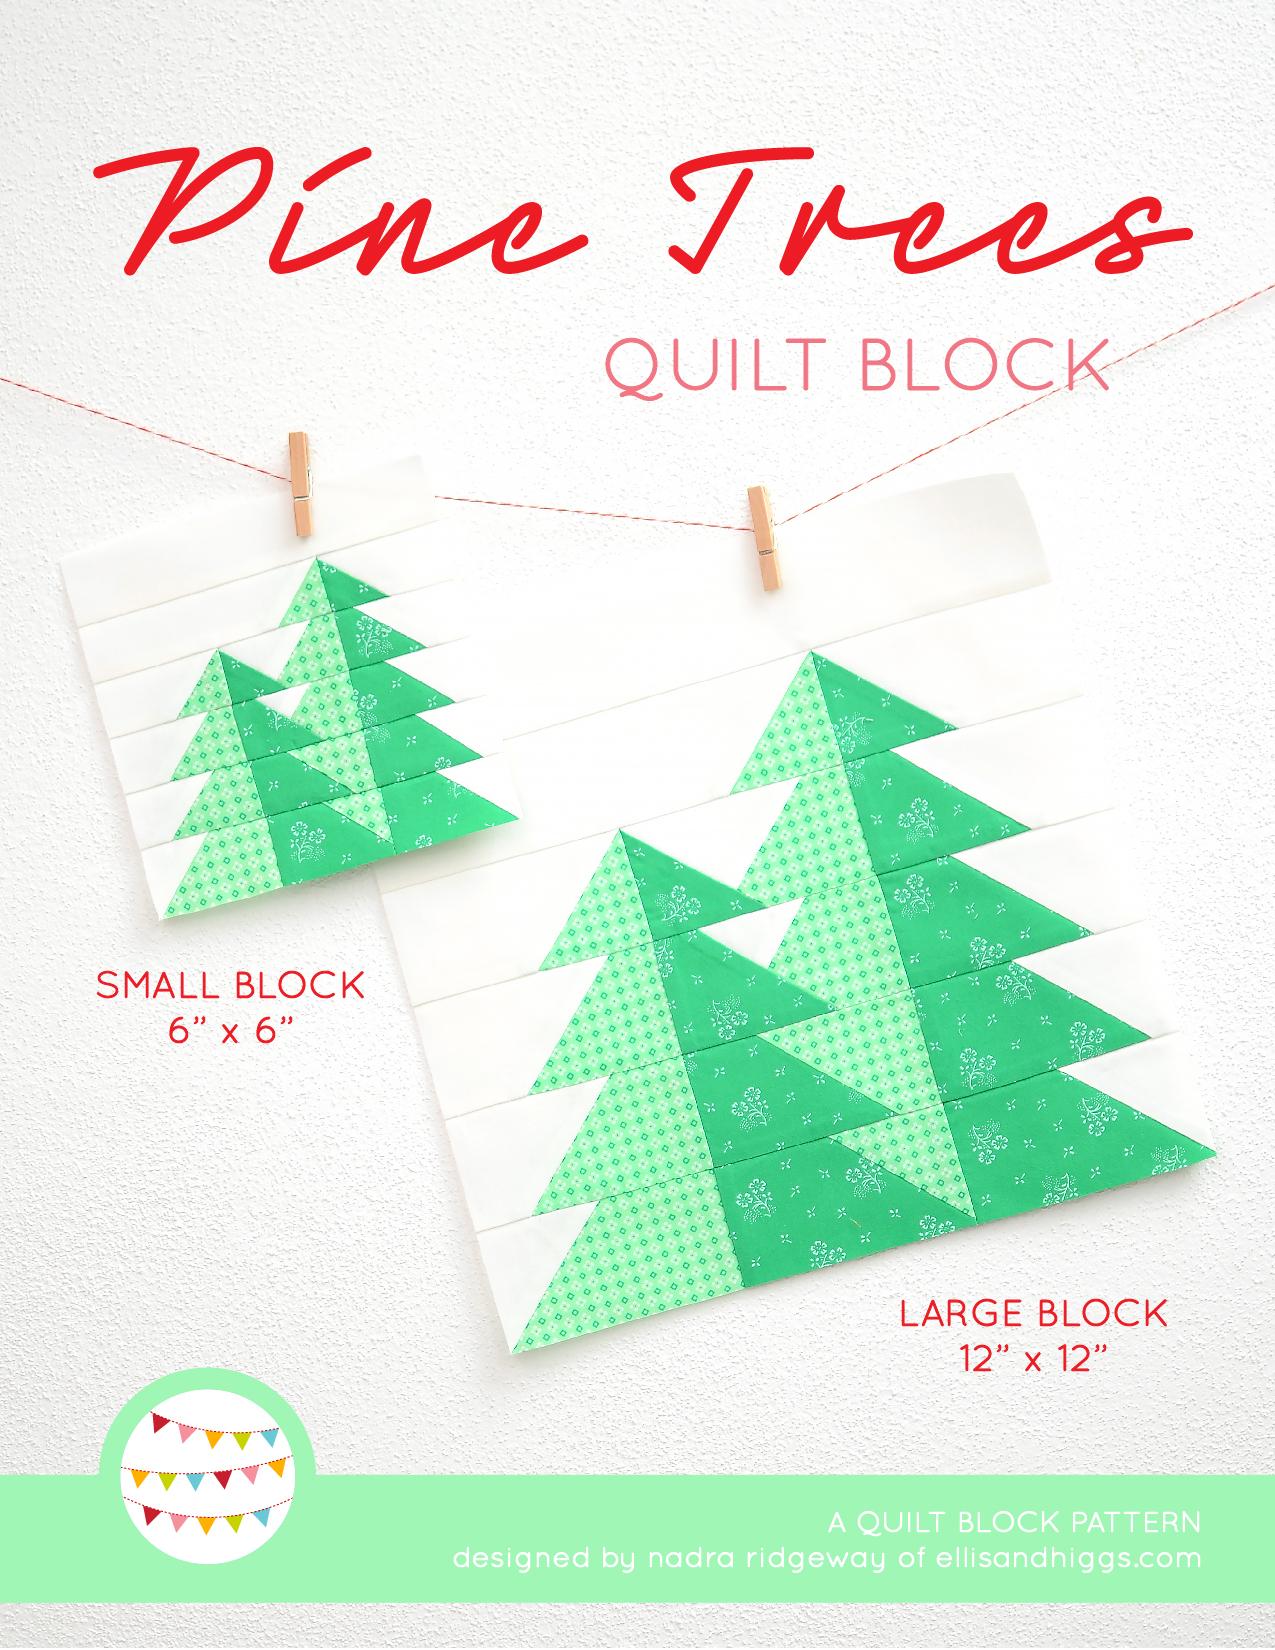 Summer quilt patterns - Pine Trees quilt pattern